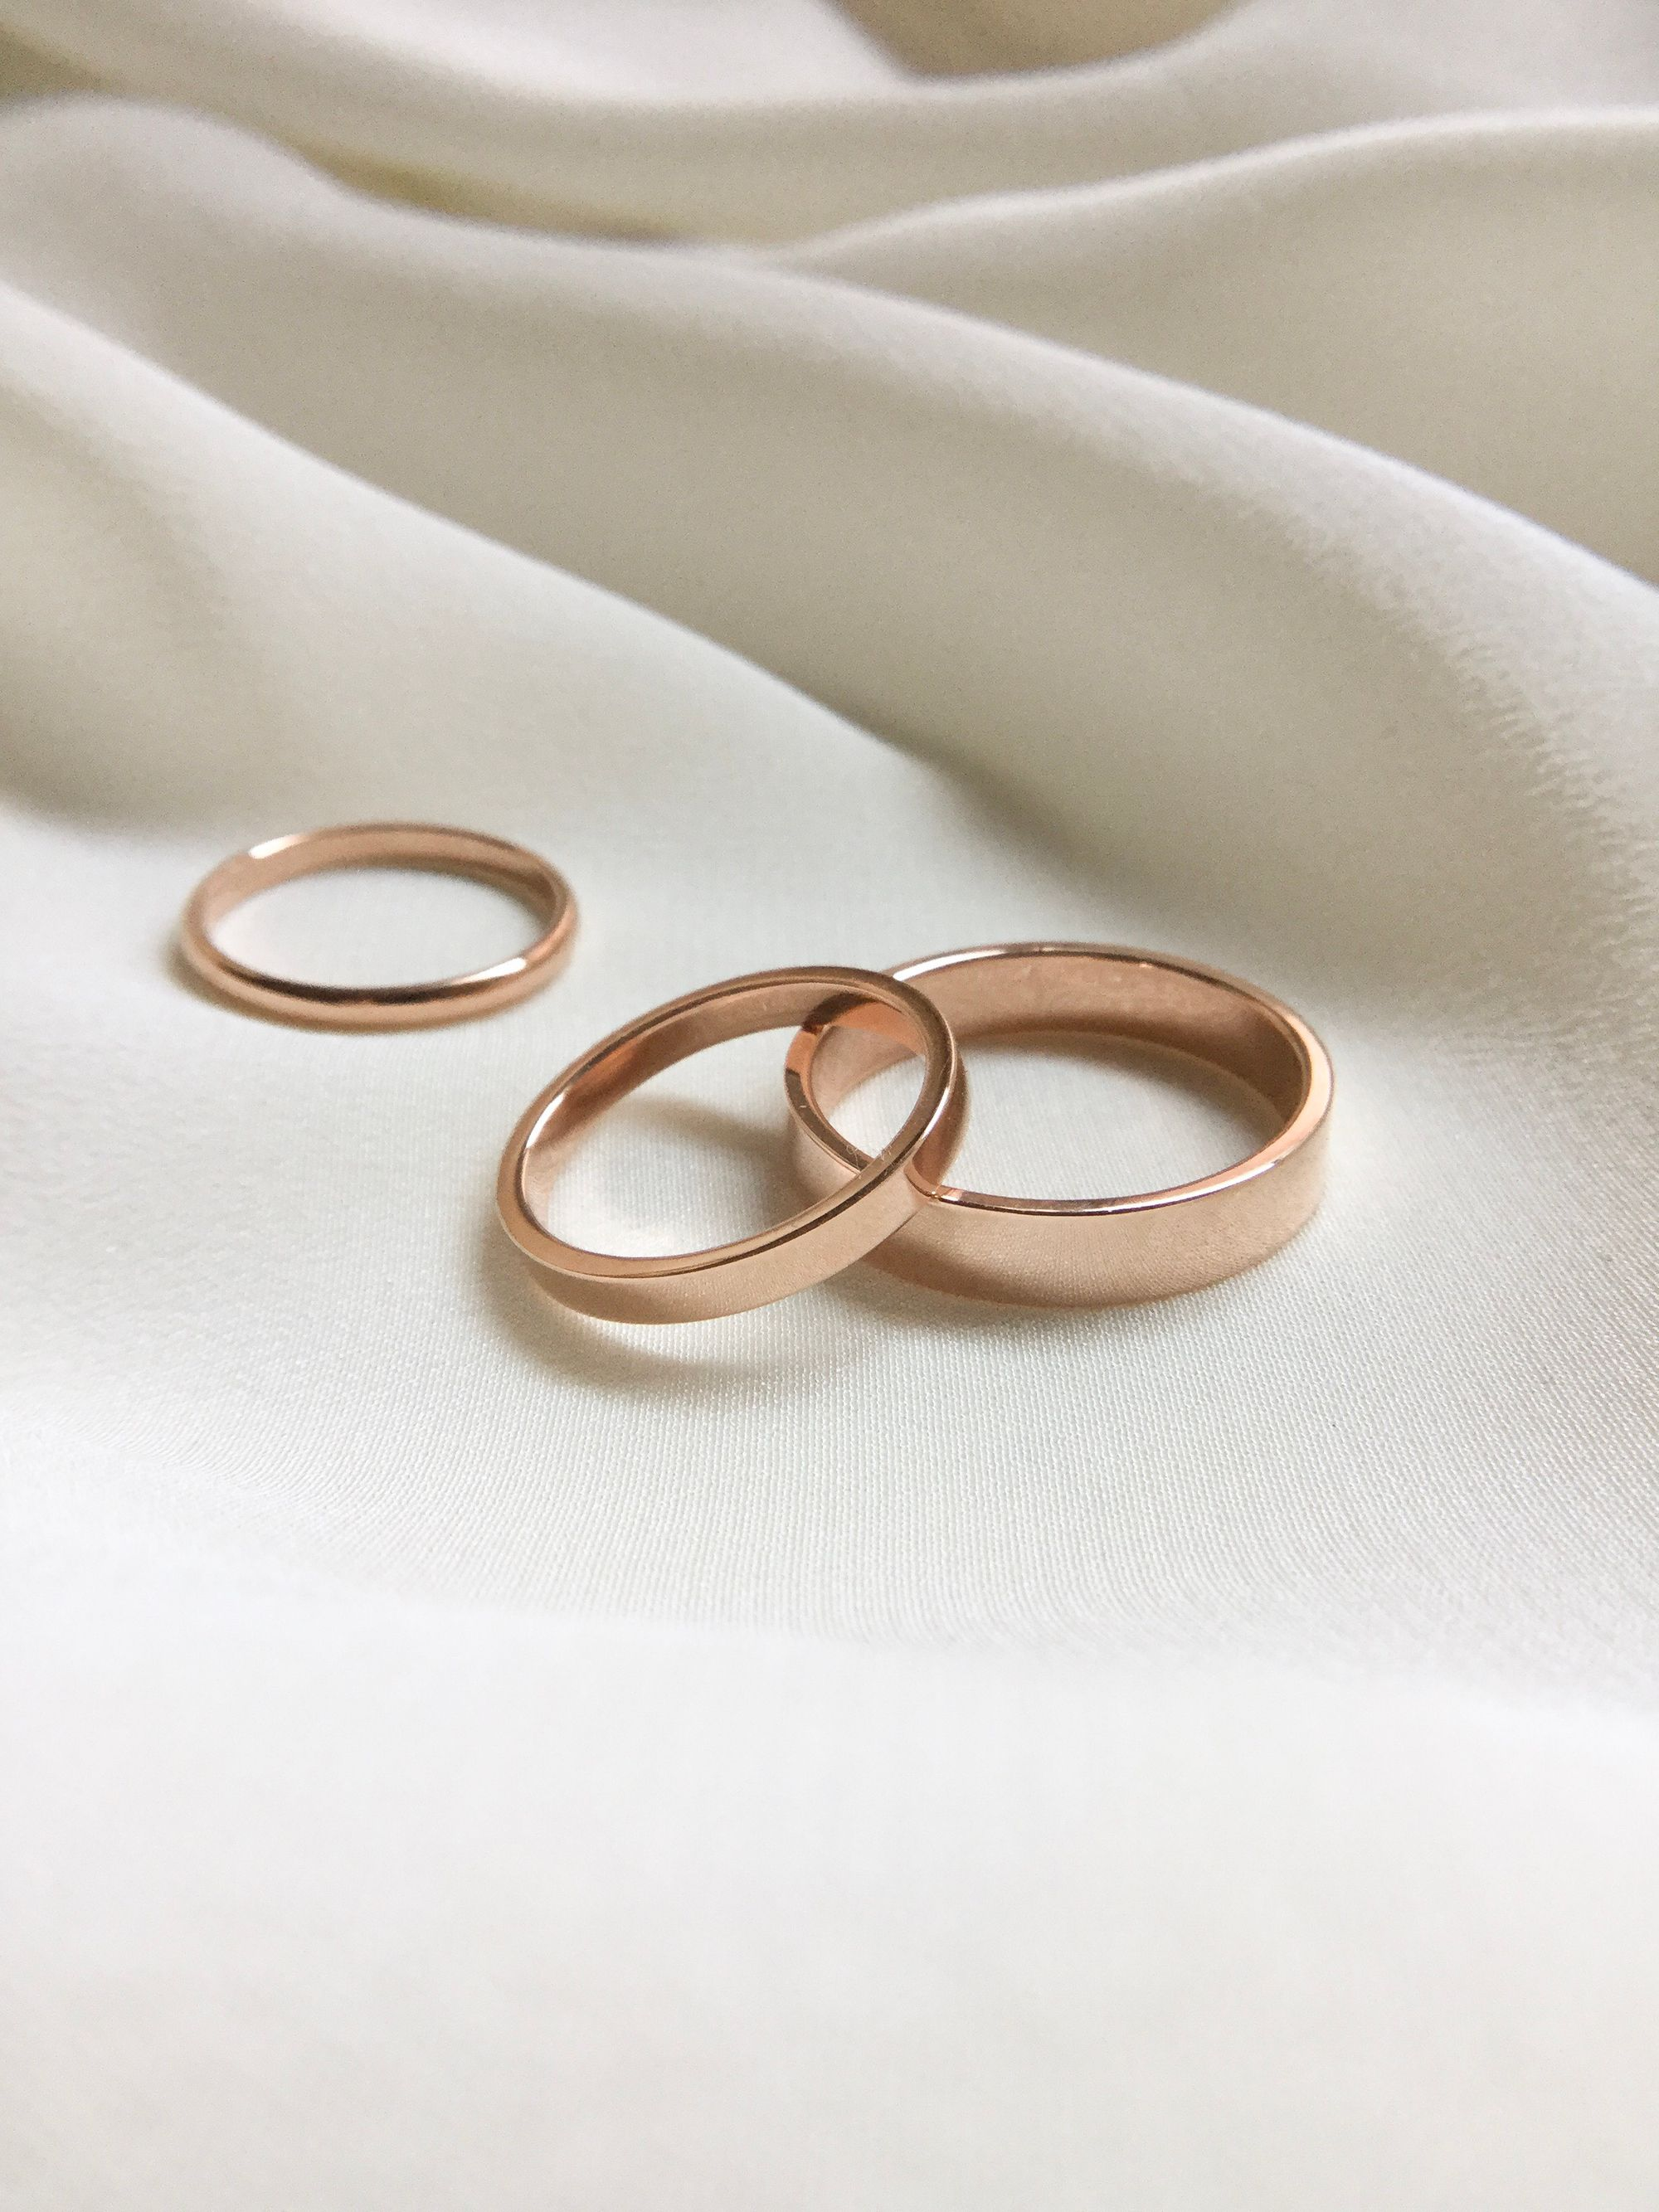 Flat Edge Band Wedding Ring Bands Ring For Boyfriend Cz Wedding Ring Sets